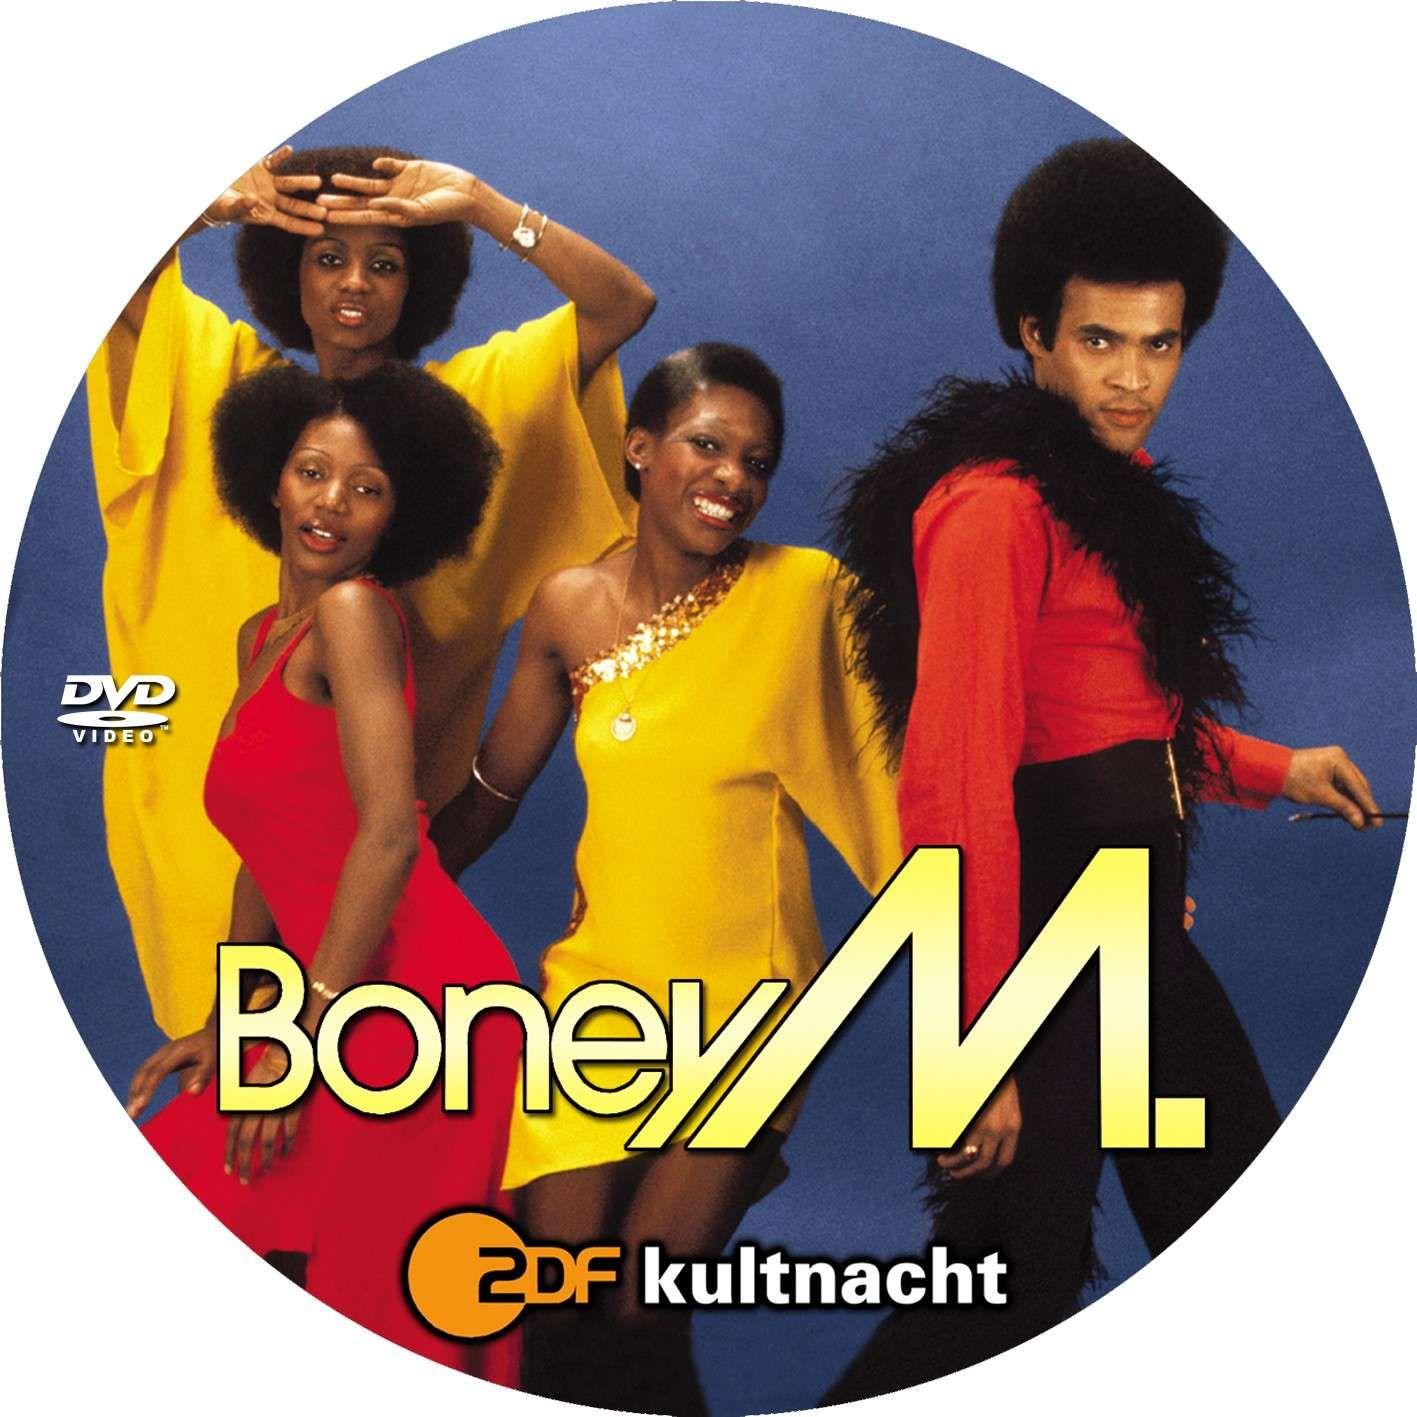 The Boney M 2 DVD